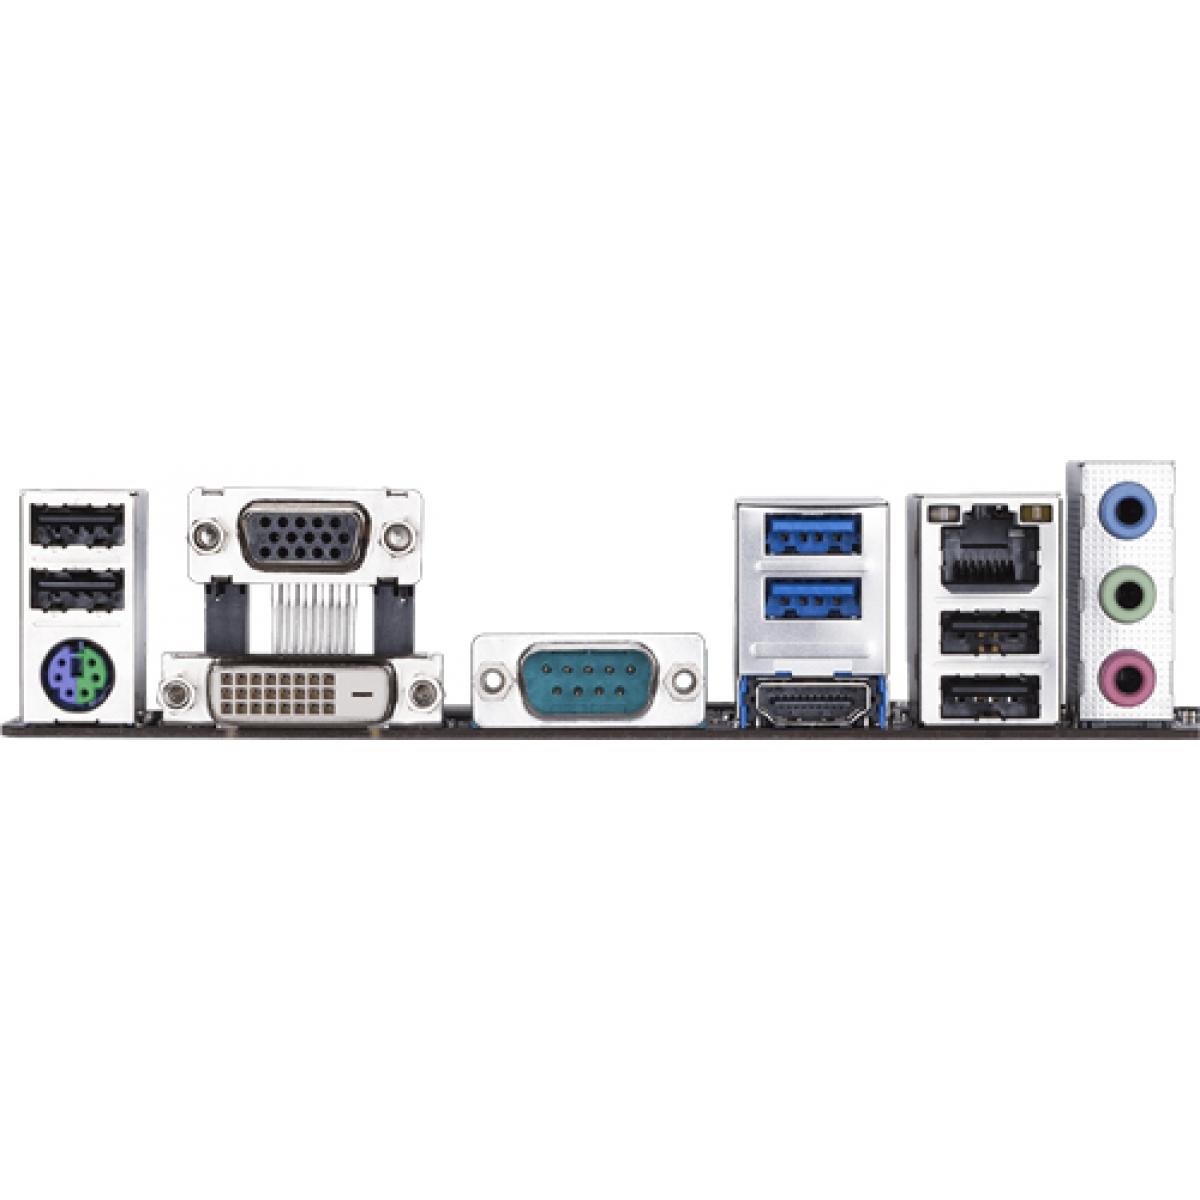 Placa Mãe Gigabyte H310M S2P, Chipset H310, Intel LGA 1151, mATX, DDR4